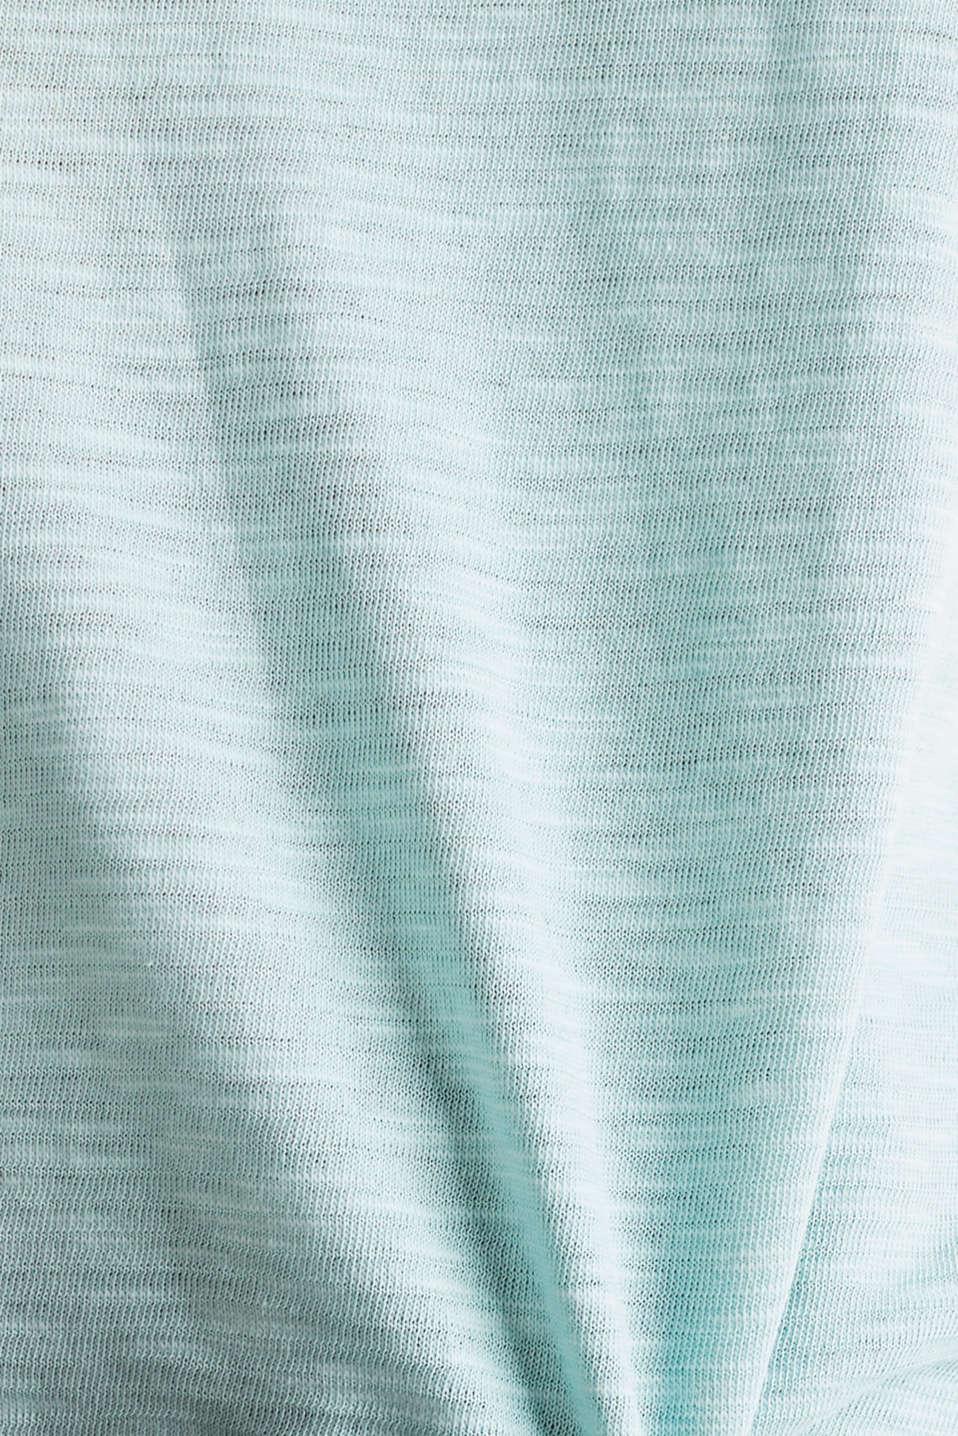 Slub top with a casual cut, LIGHT AQUA GREEN 4, detail image number 4